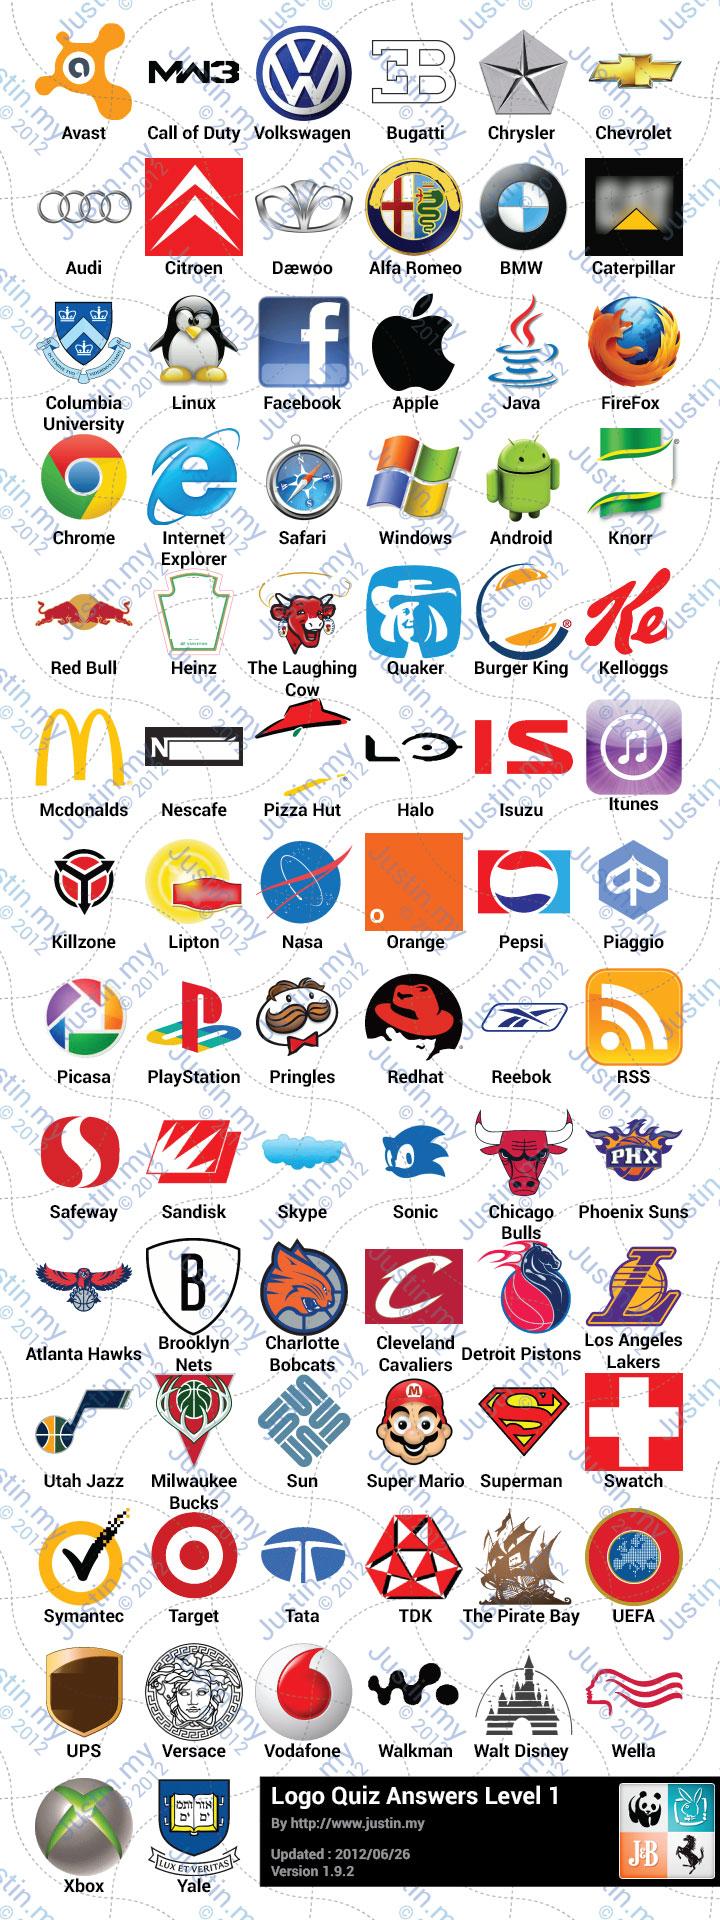 Logos Quiz Answers Level 1